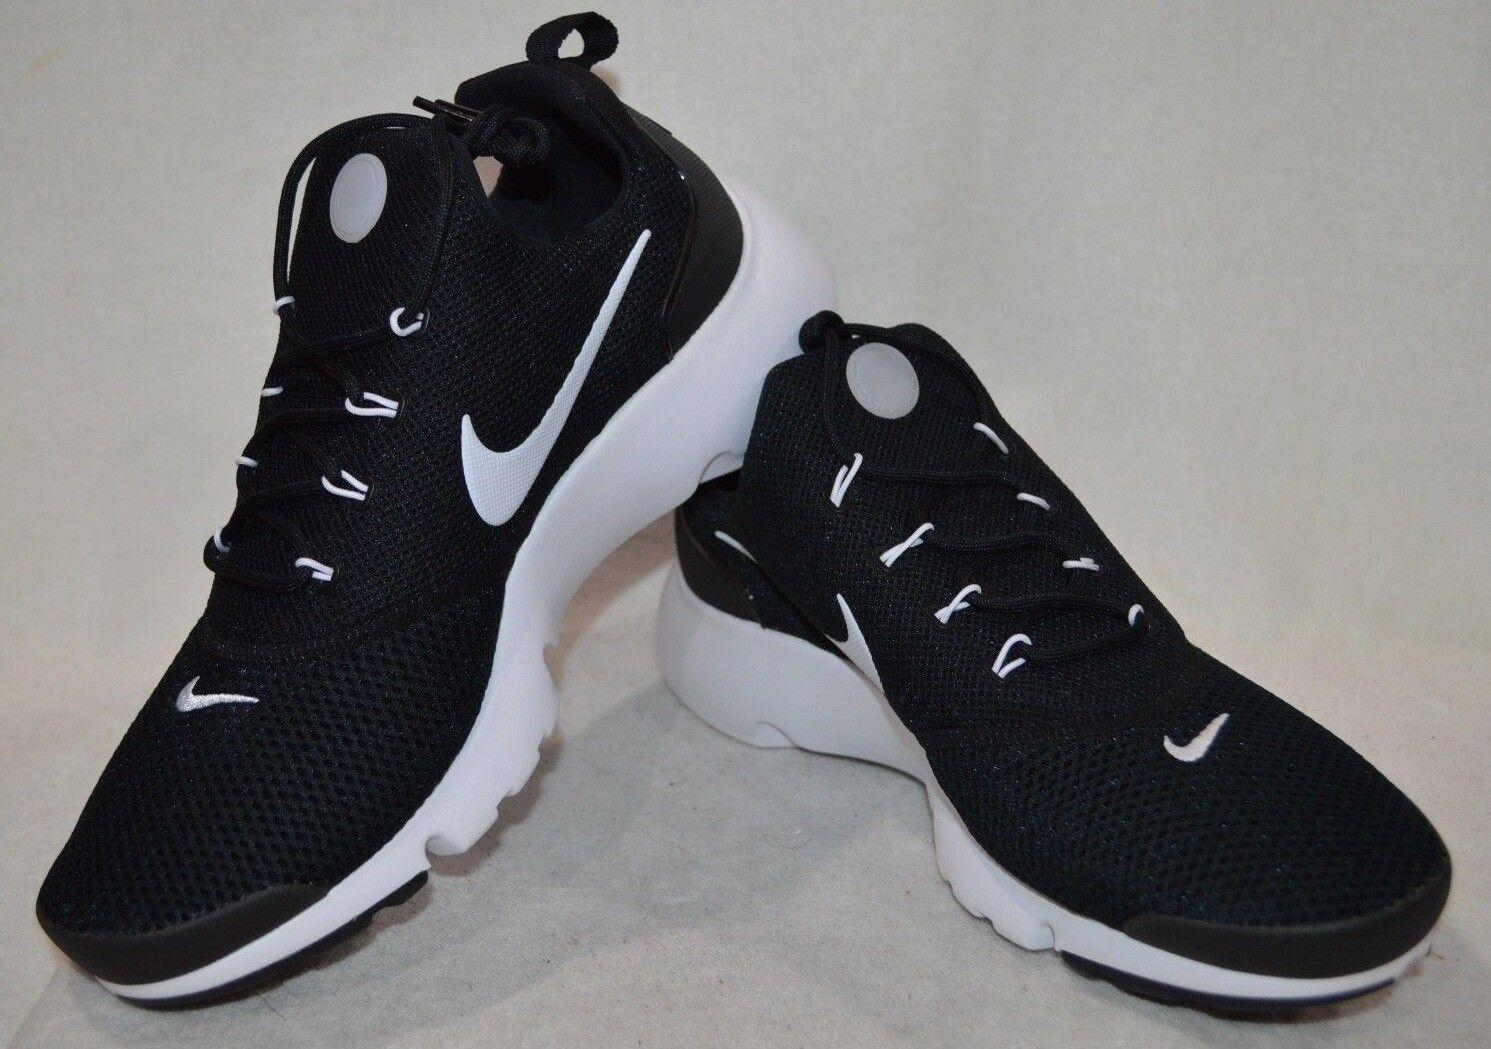 Nike Presto Fly Black White Men's Sneakers - Assorted Sizes NWB 908019-002